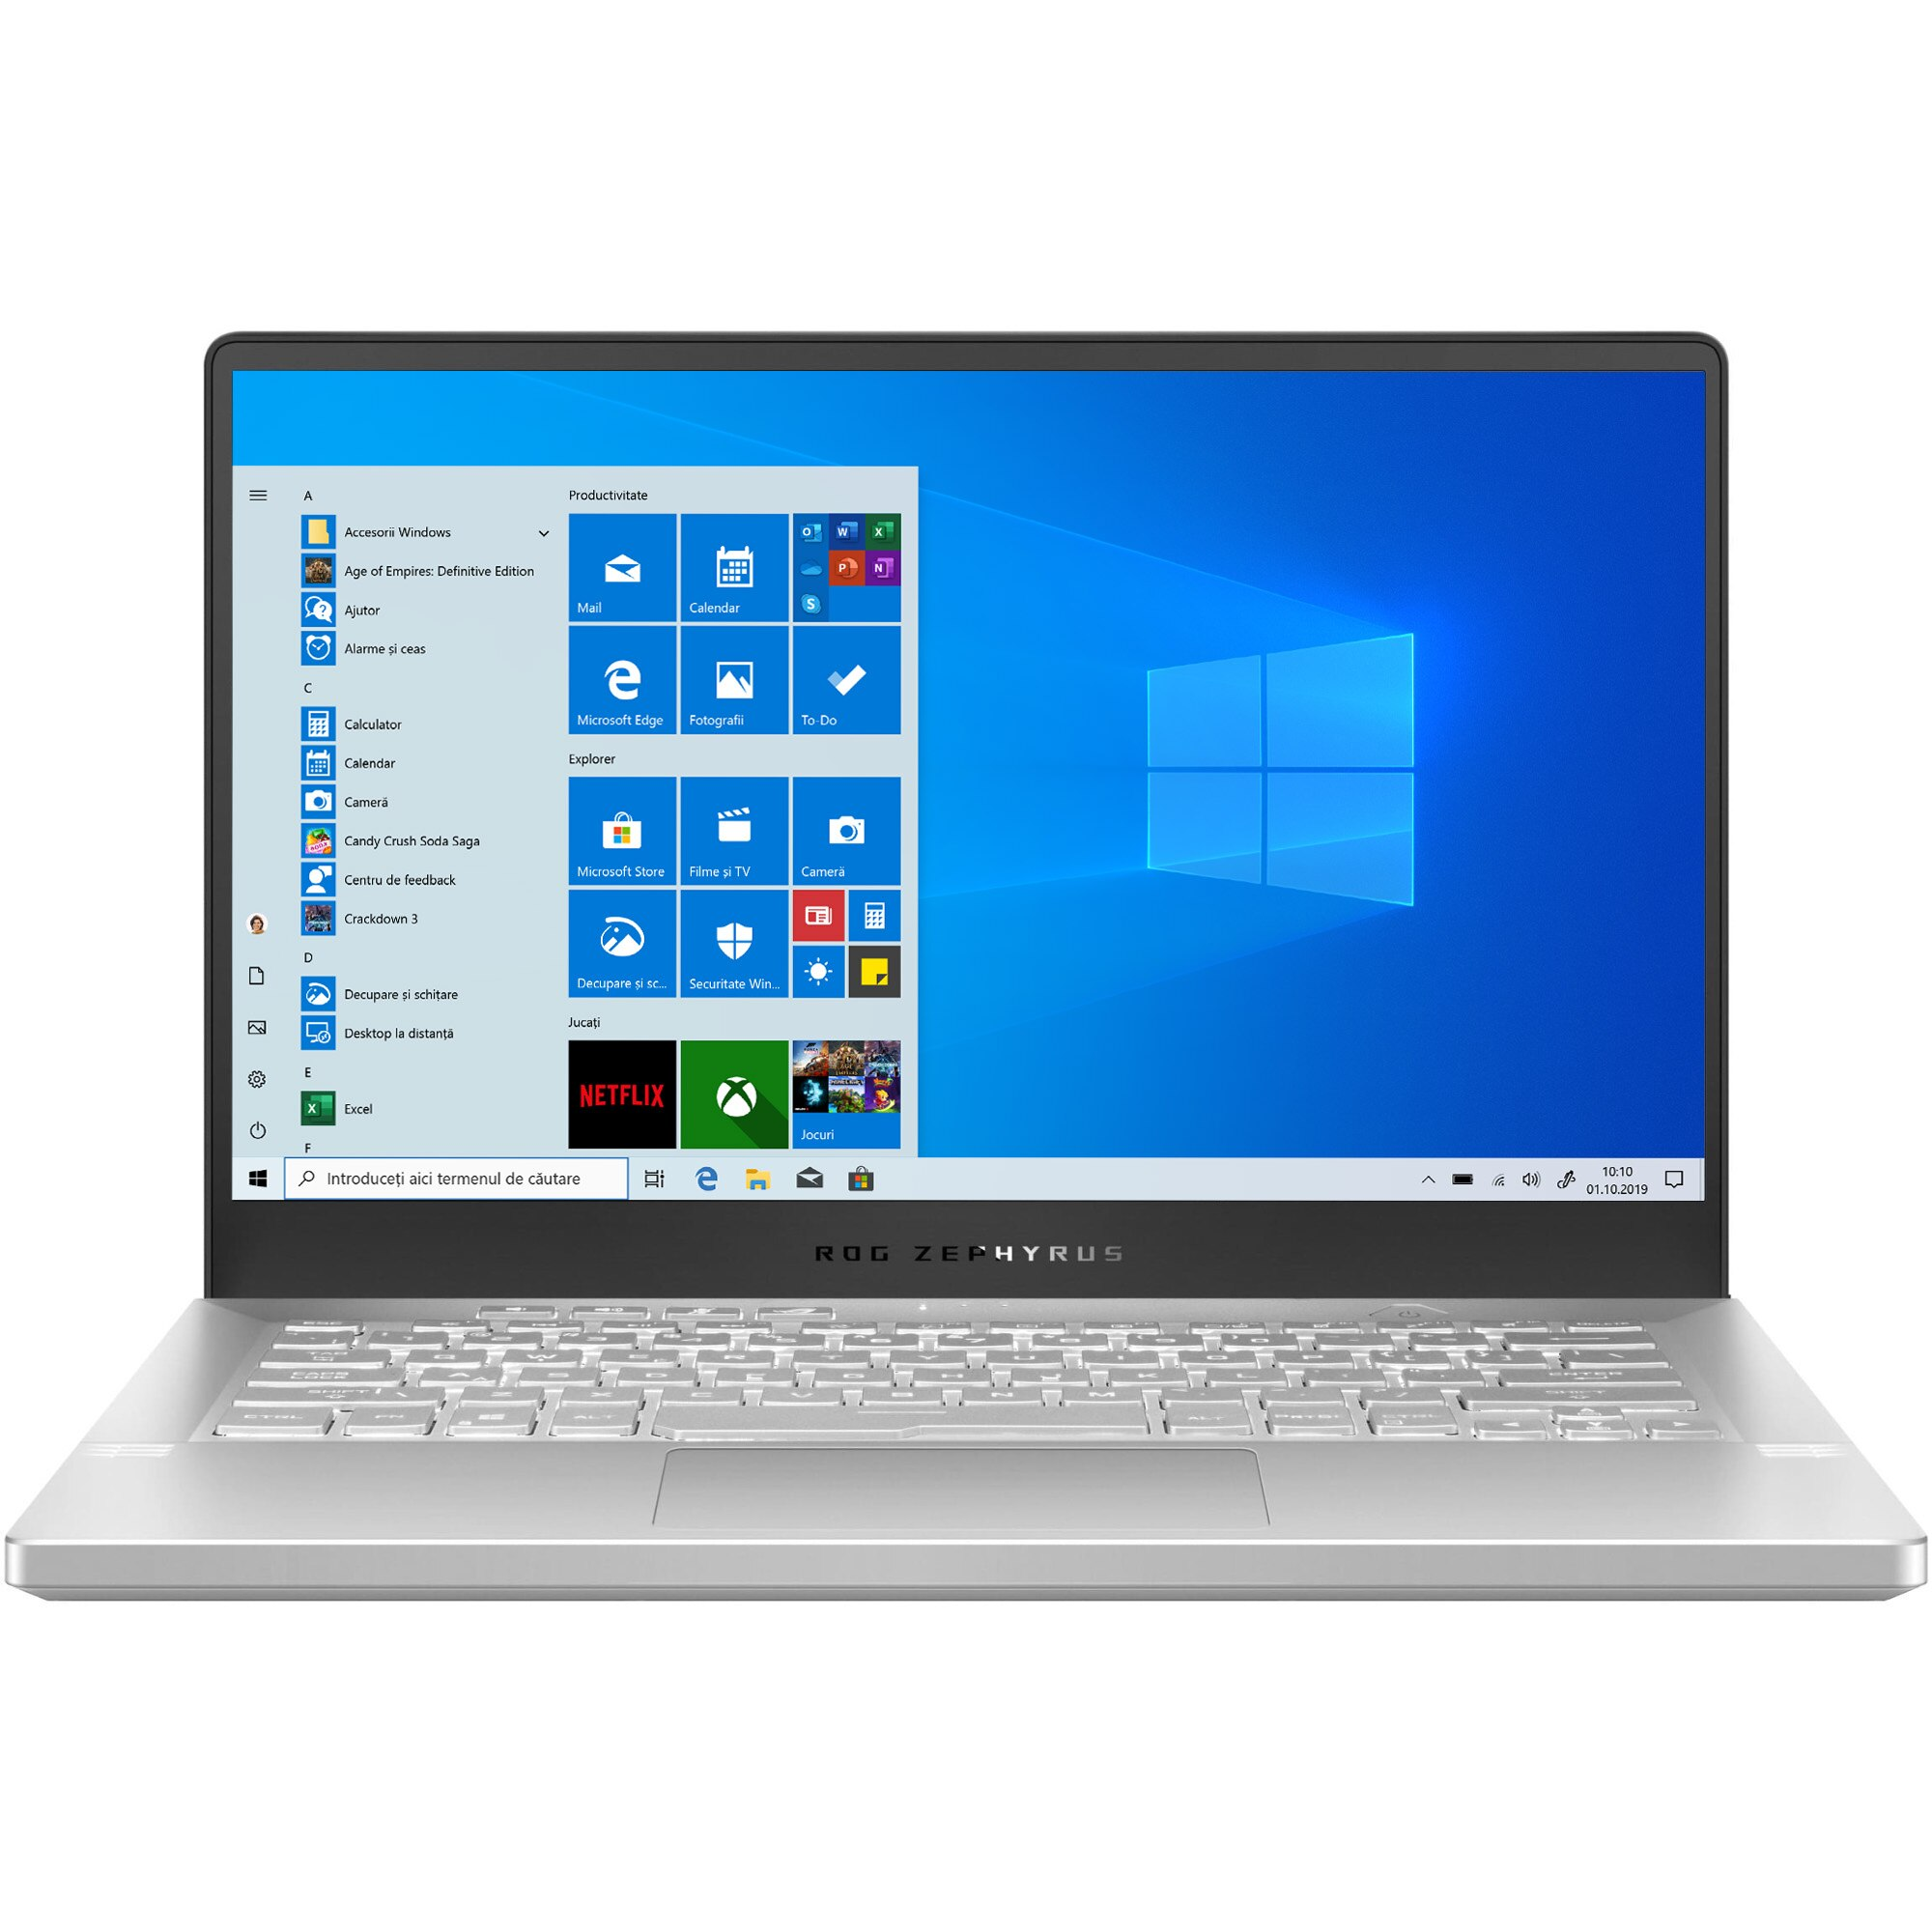 "Fotografie Laptop Gaming ASUS ROG Zephyrus G14 GA401II cu procesor AMD Ryzen™ 5 4600HS pana la 4.00 GHz, 14"", Full HD, 120Hz, 16GB, 512GB SSD, NVIDIA® GeForce® GTX 1650 Ti 4GB, Windows 10 Home, Moonlight White AniMe Matrix"